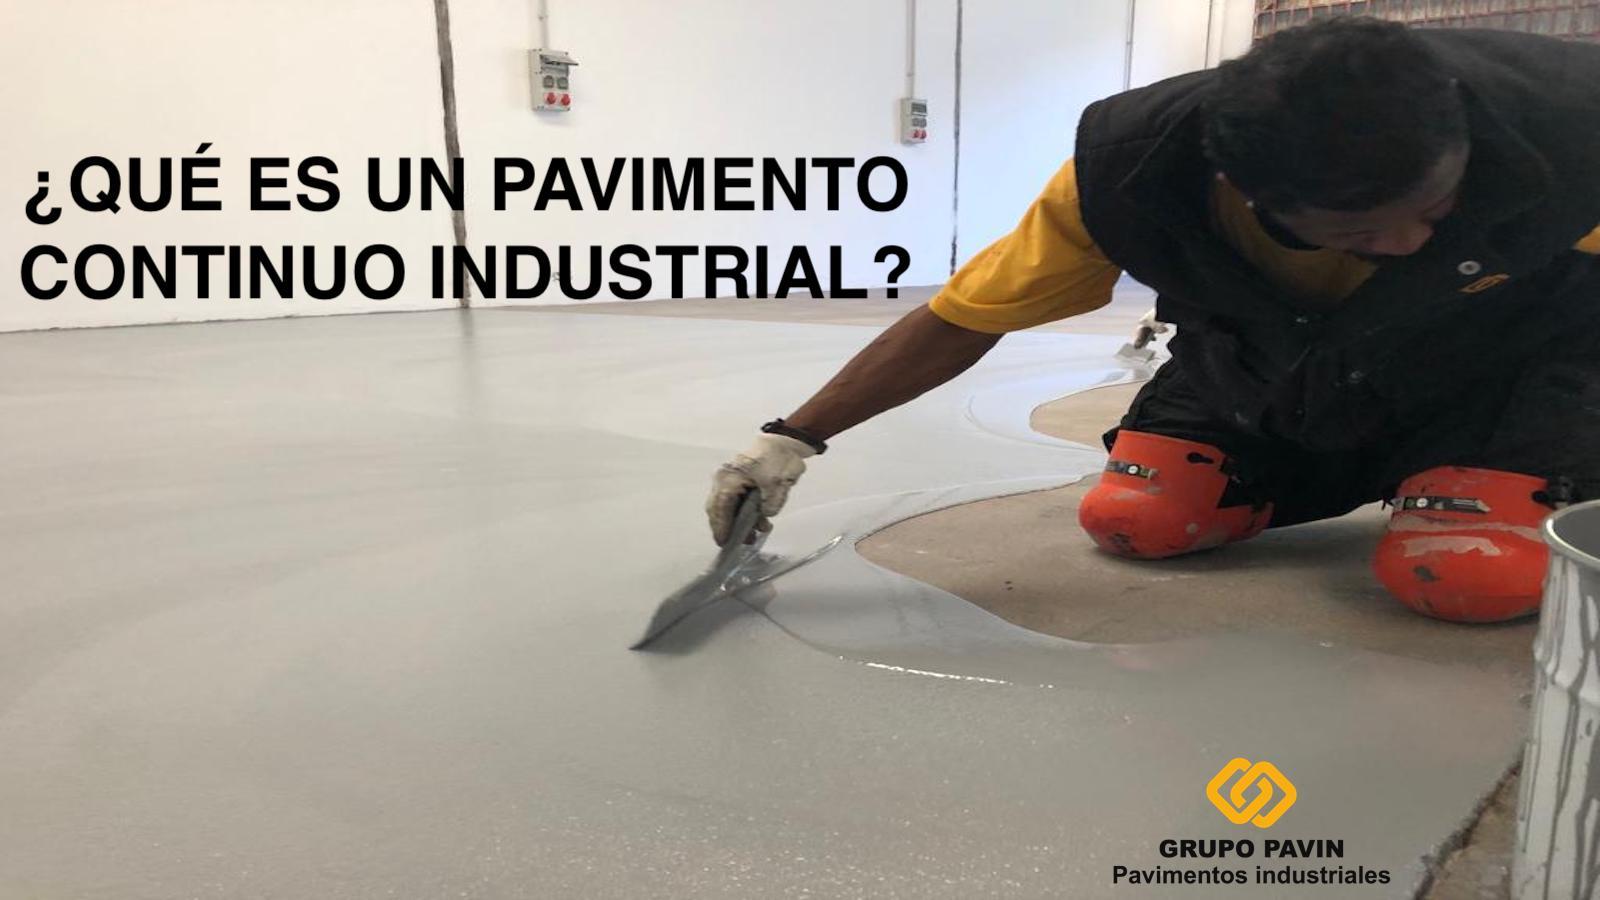 Pavimento continuo industrial